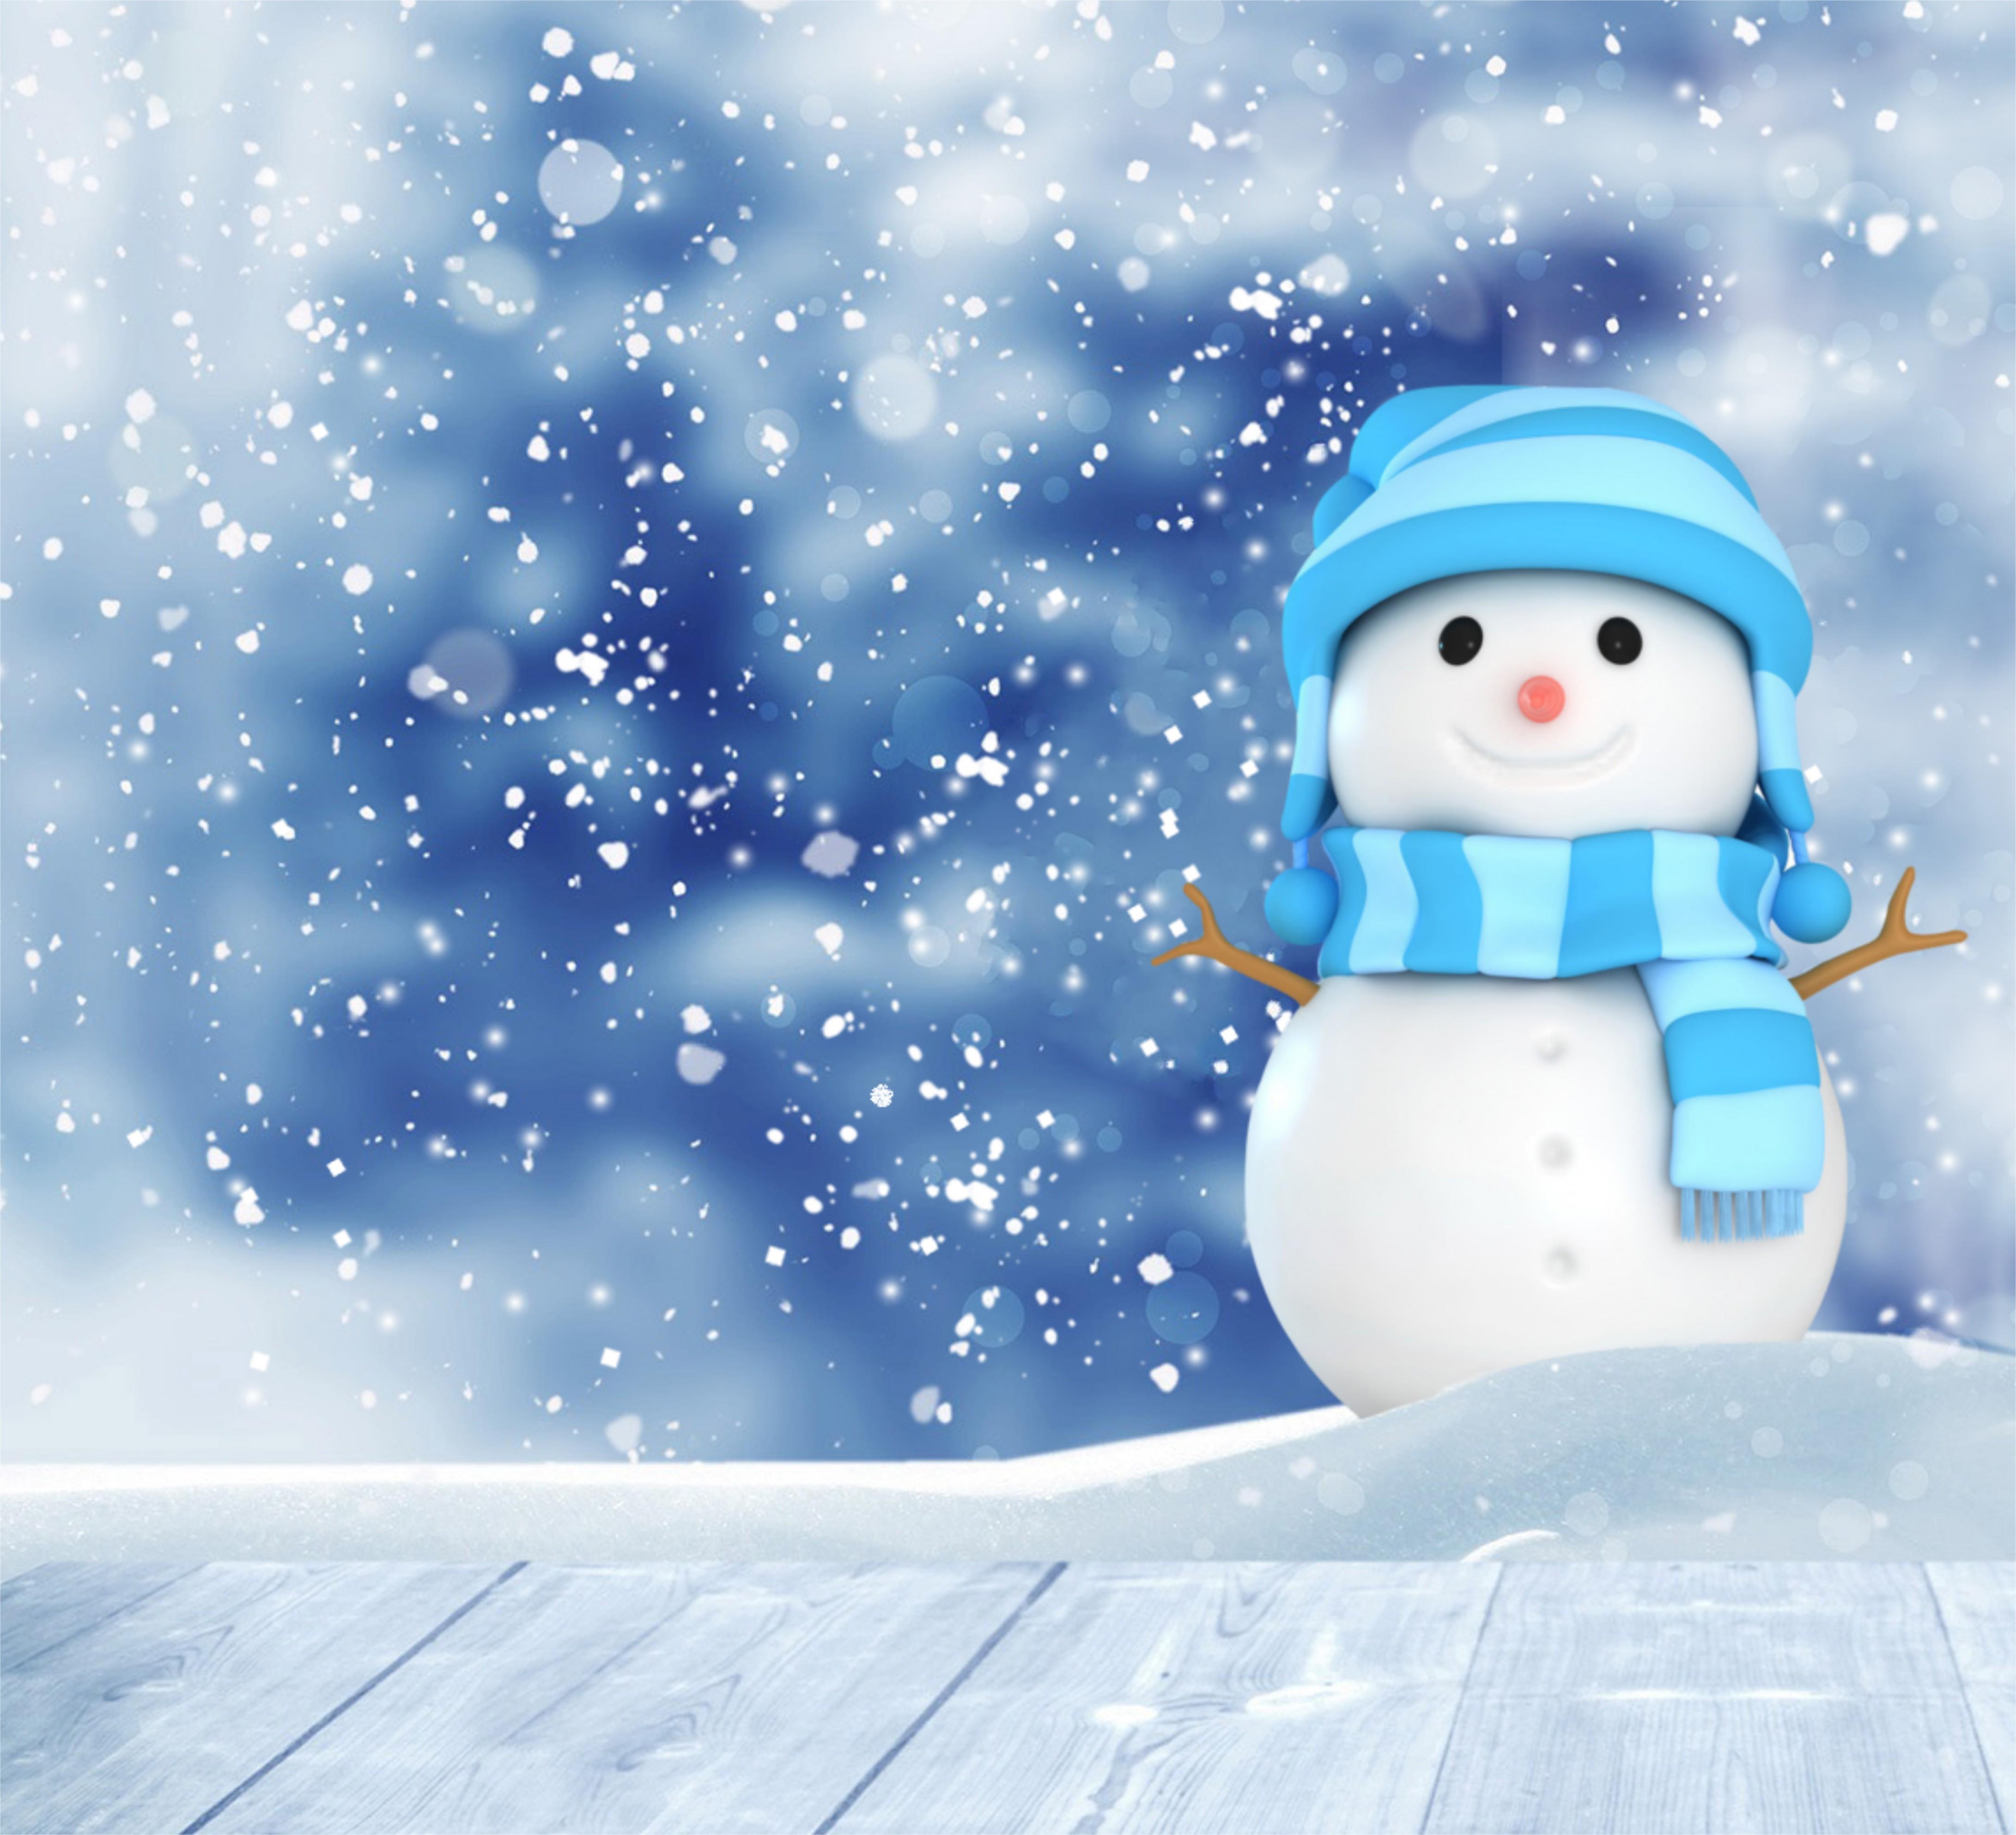 рождество,снежинки,снег,пингвиненок  № 442170 без смс